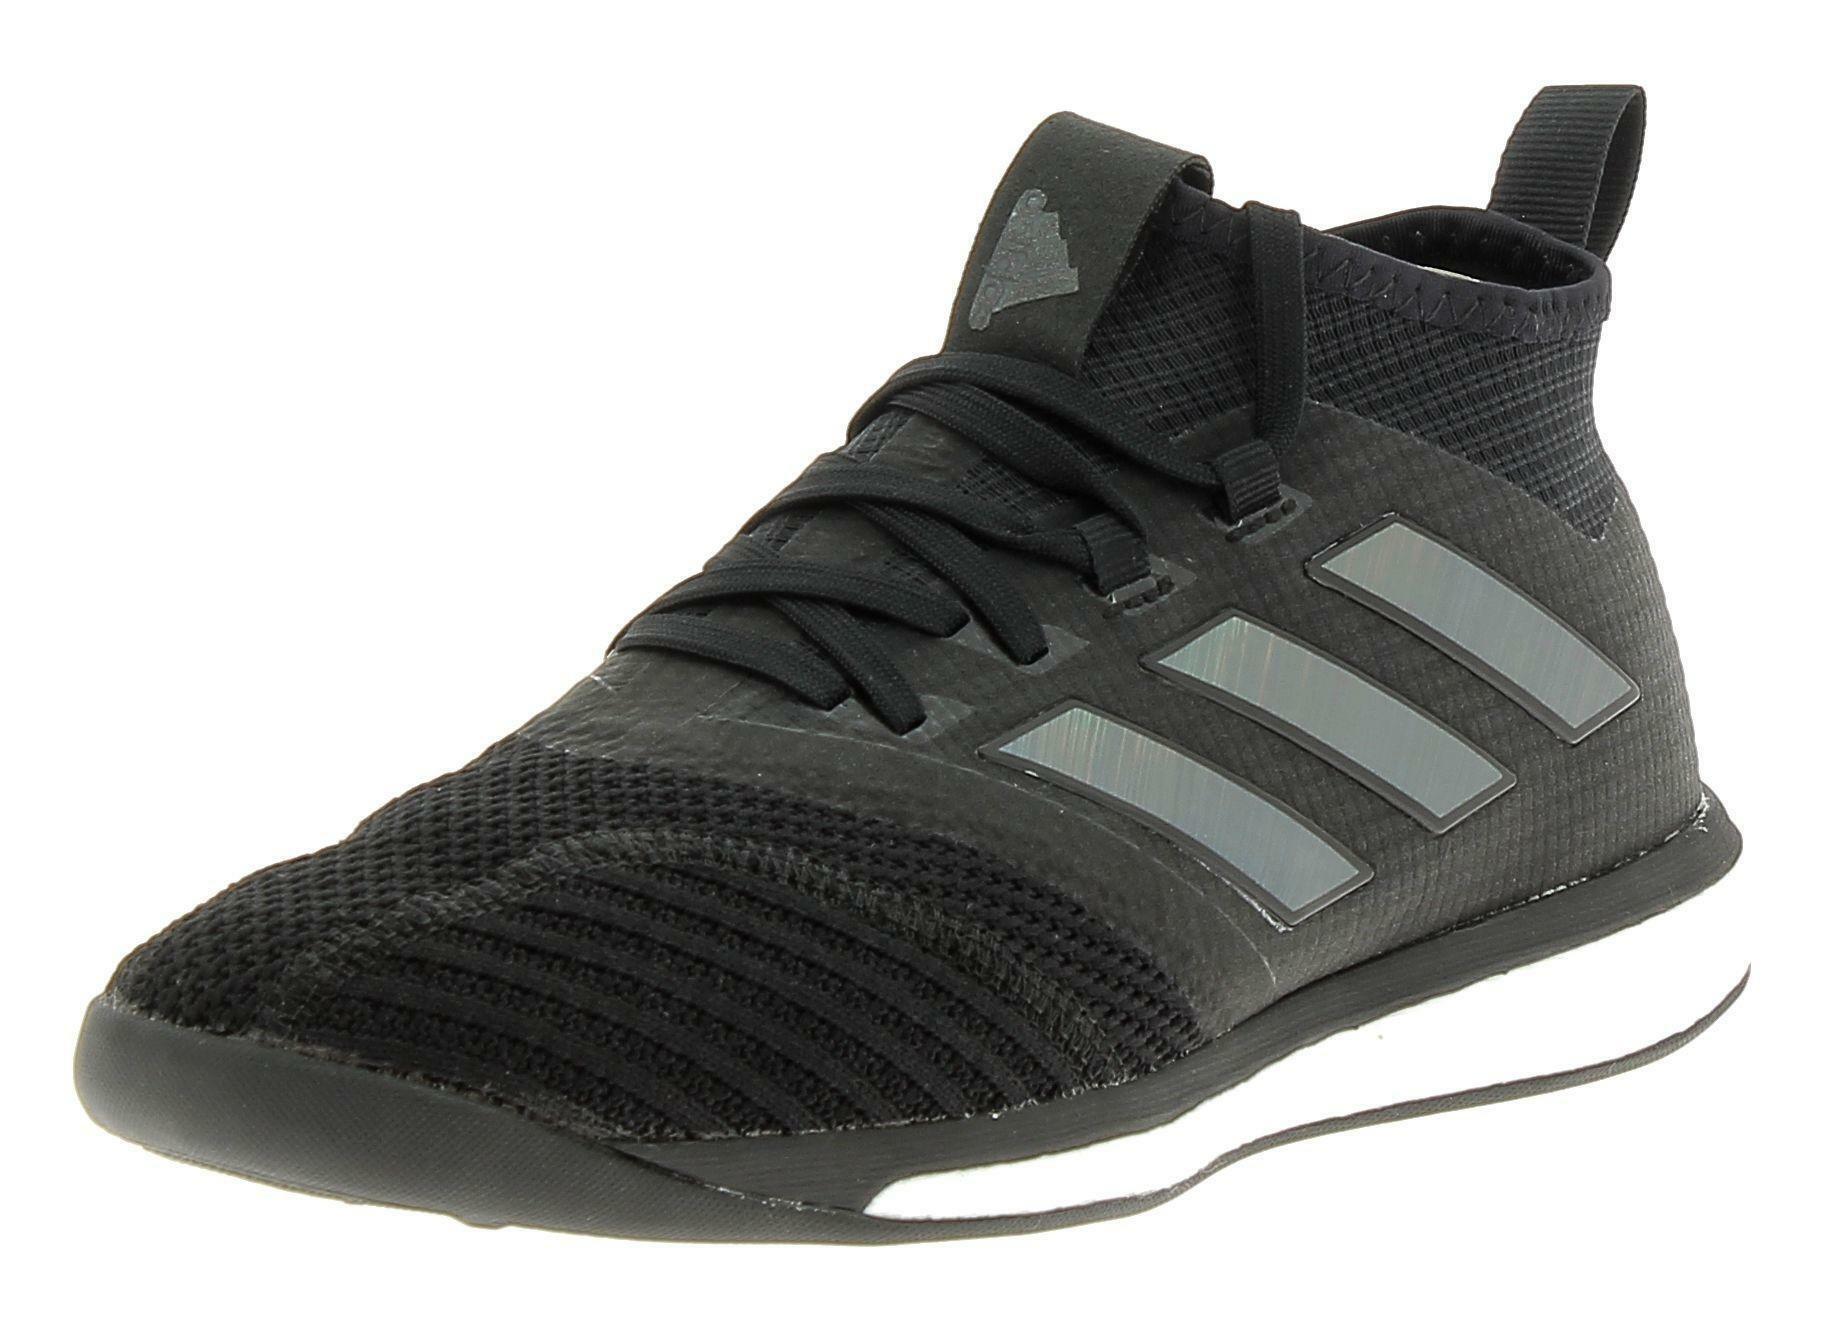 adidas adidas ace tango 17.1 tr scarpini calcetto uomo neri